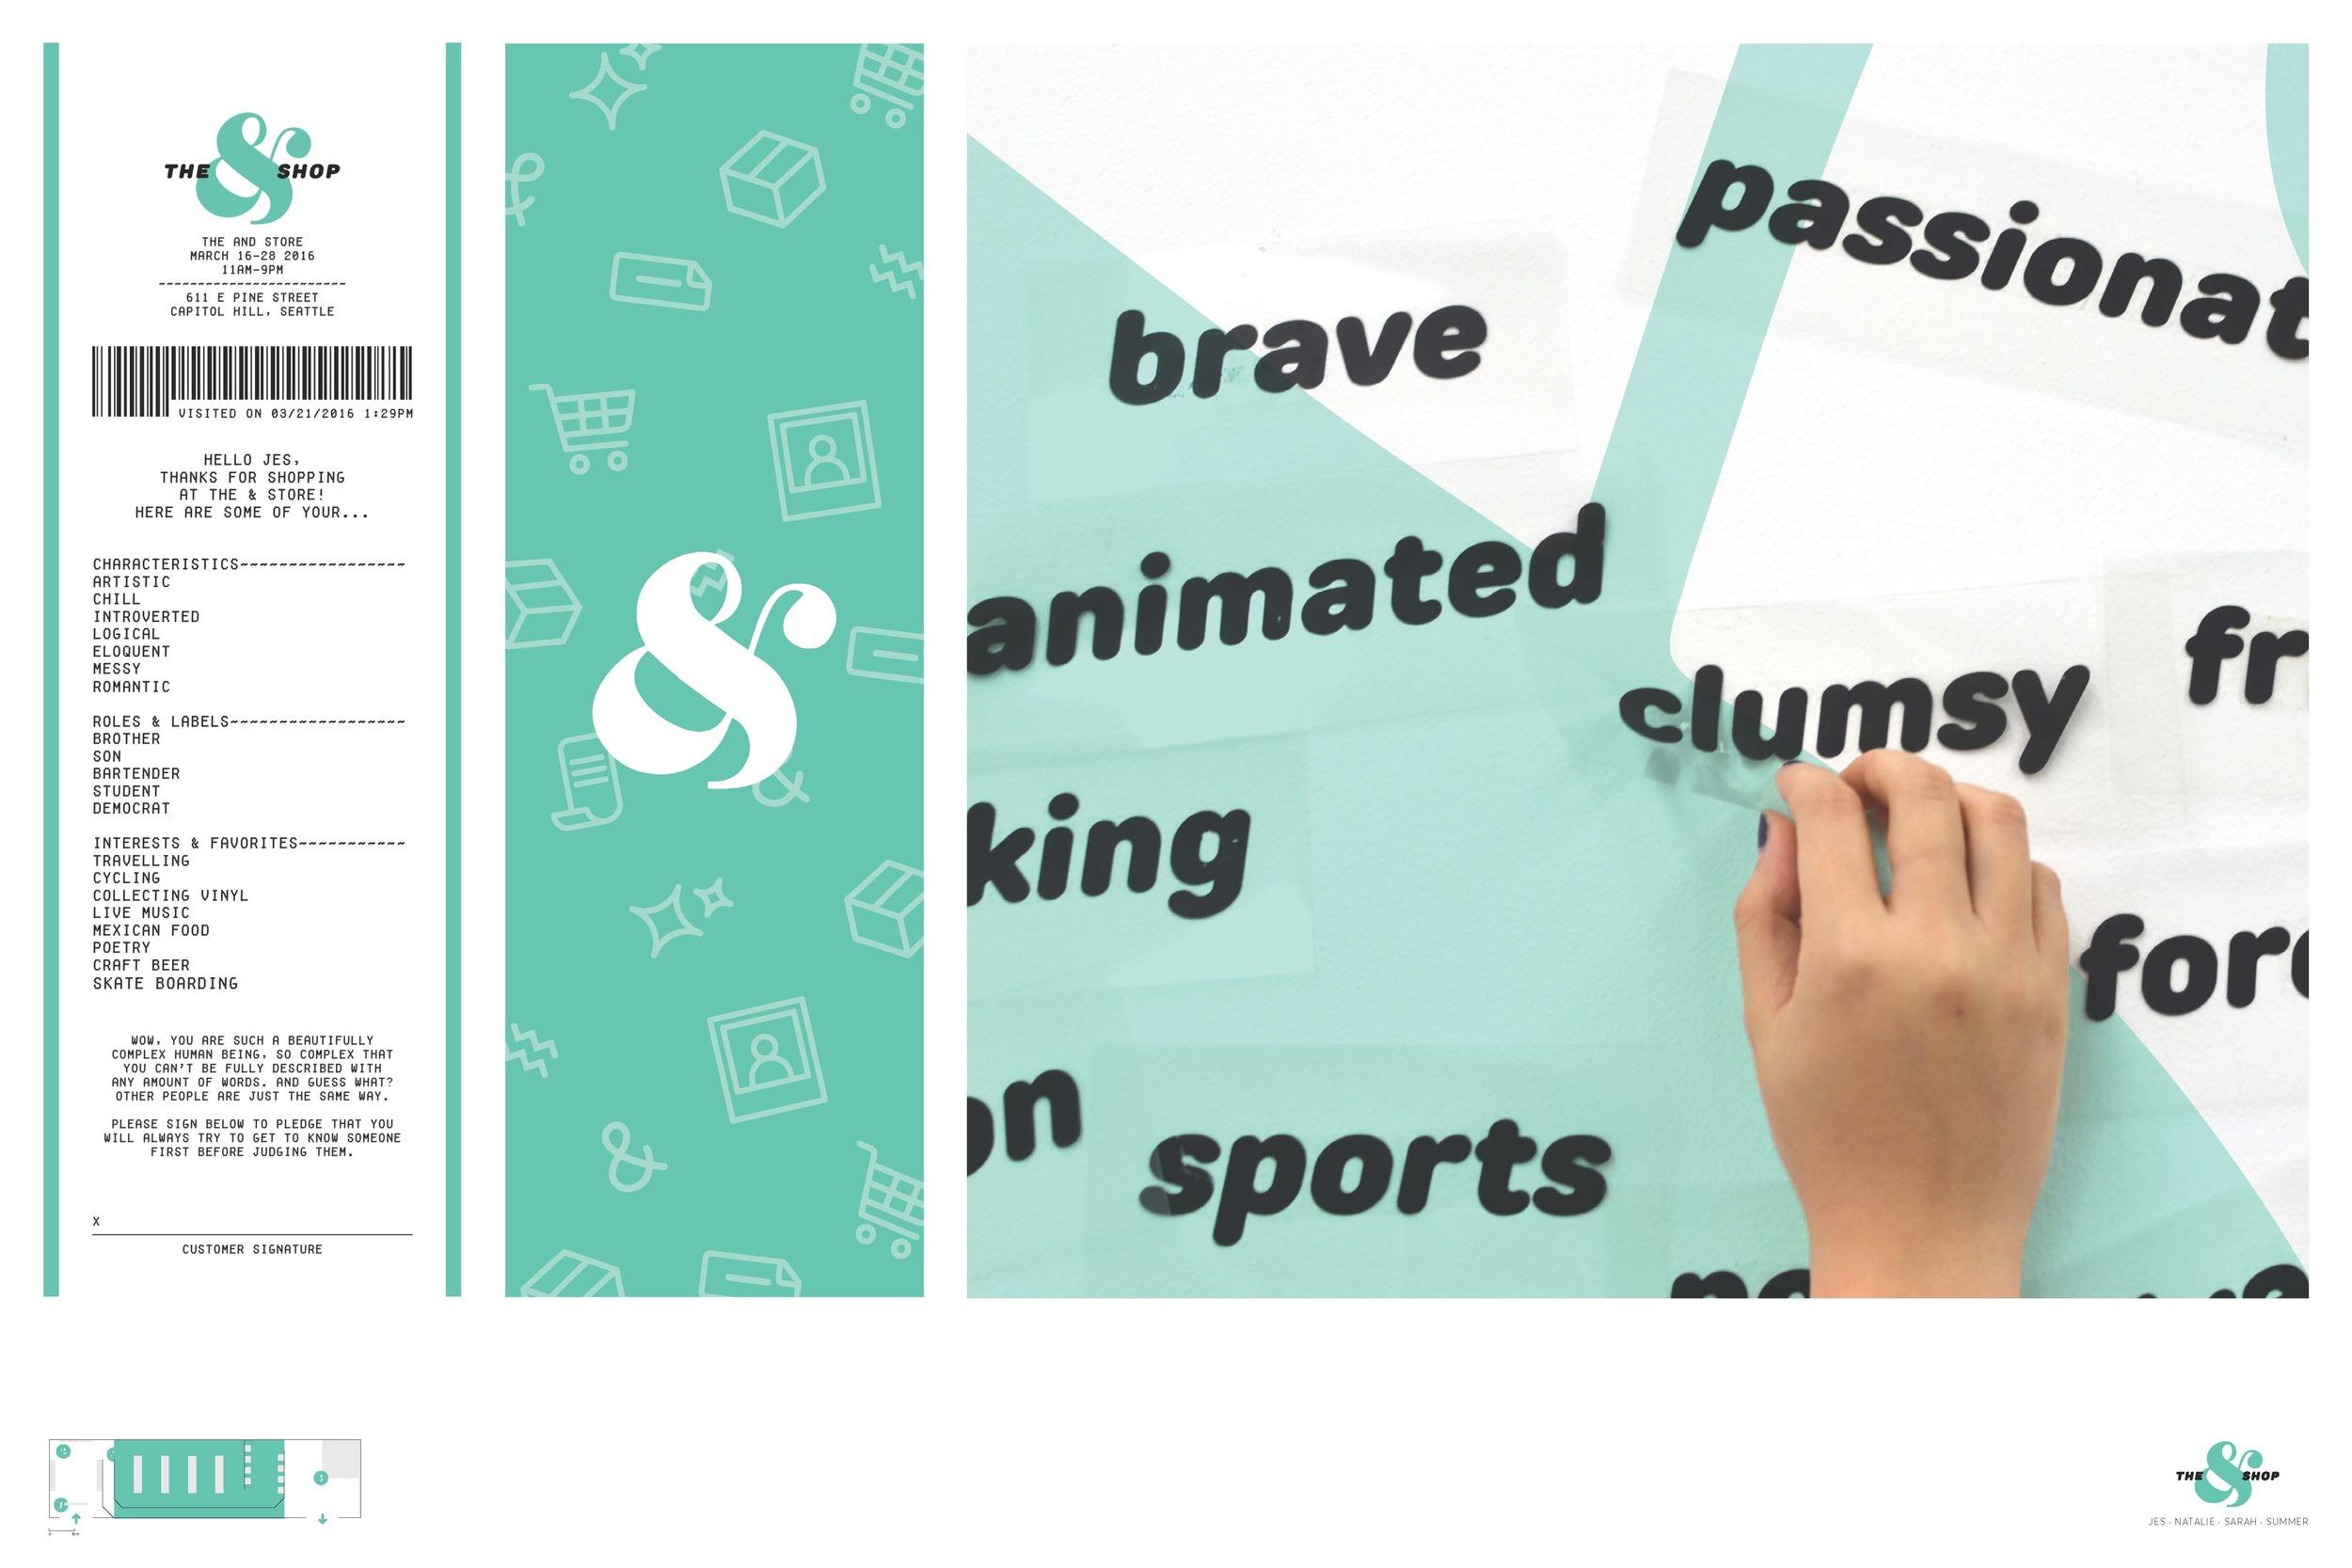 &-Shop-Digital-Presentation_Page_12.jpg